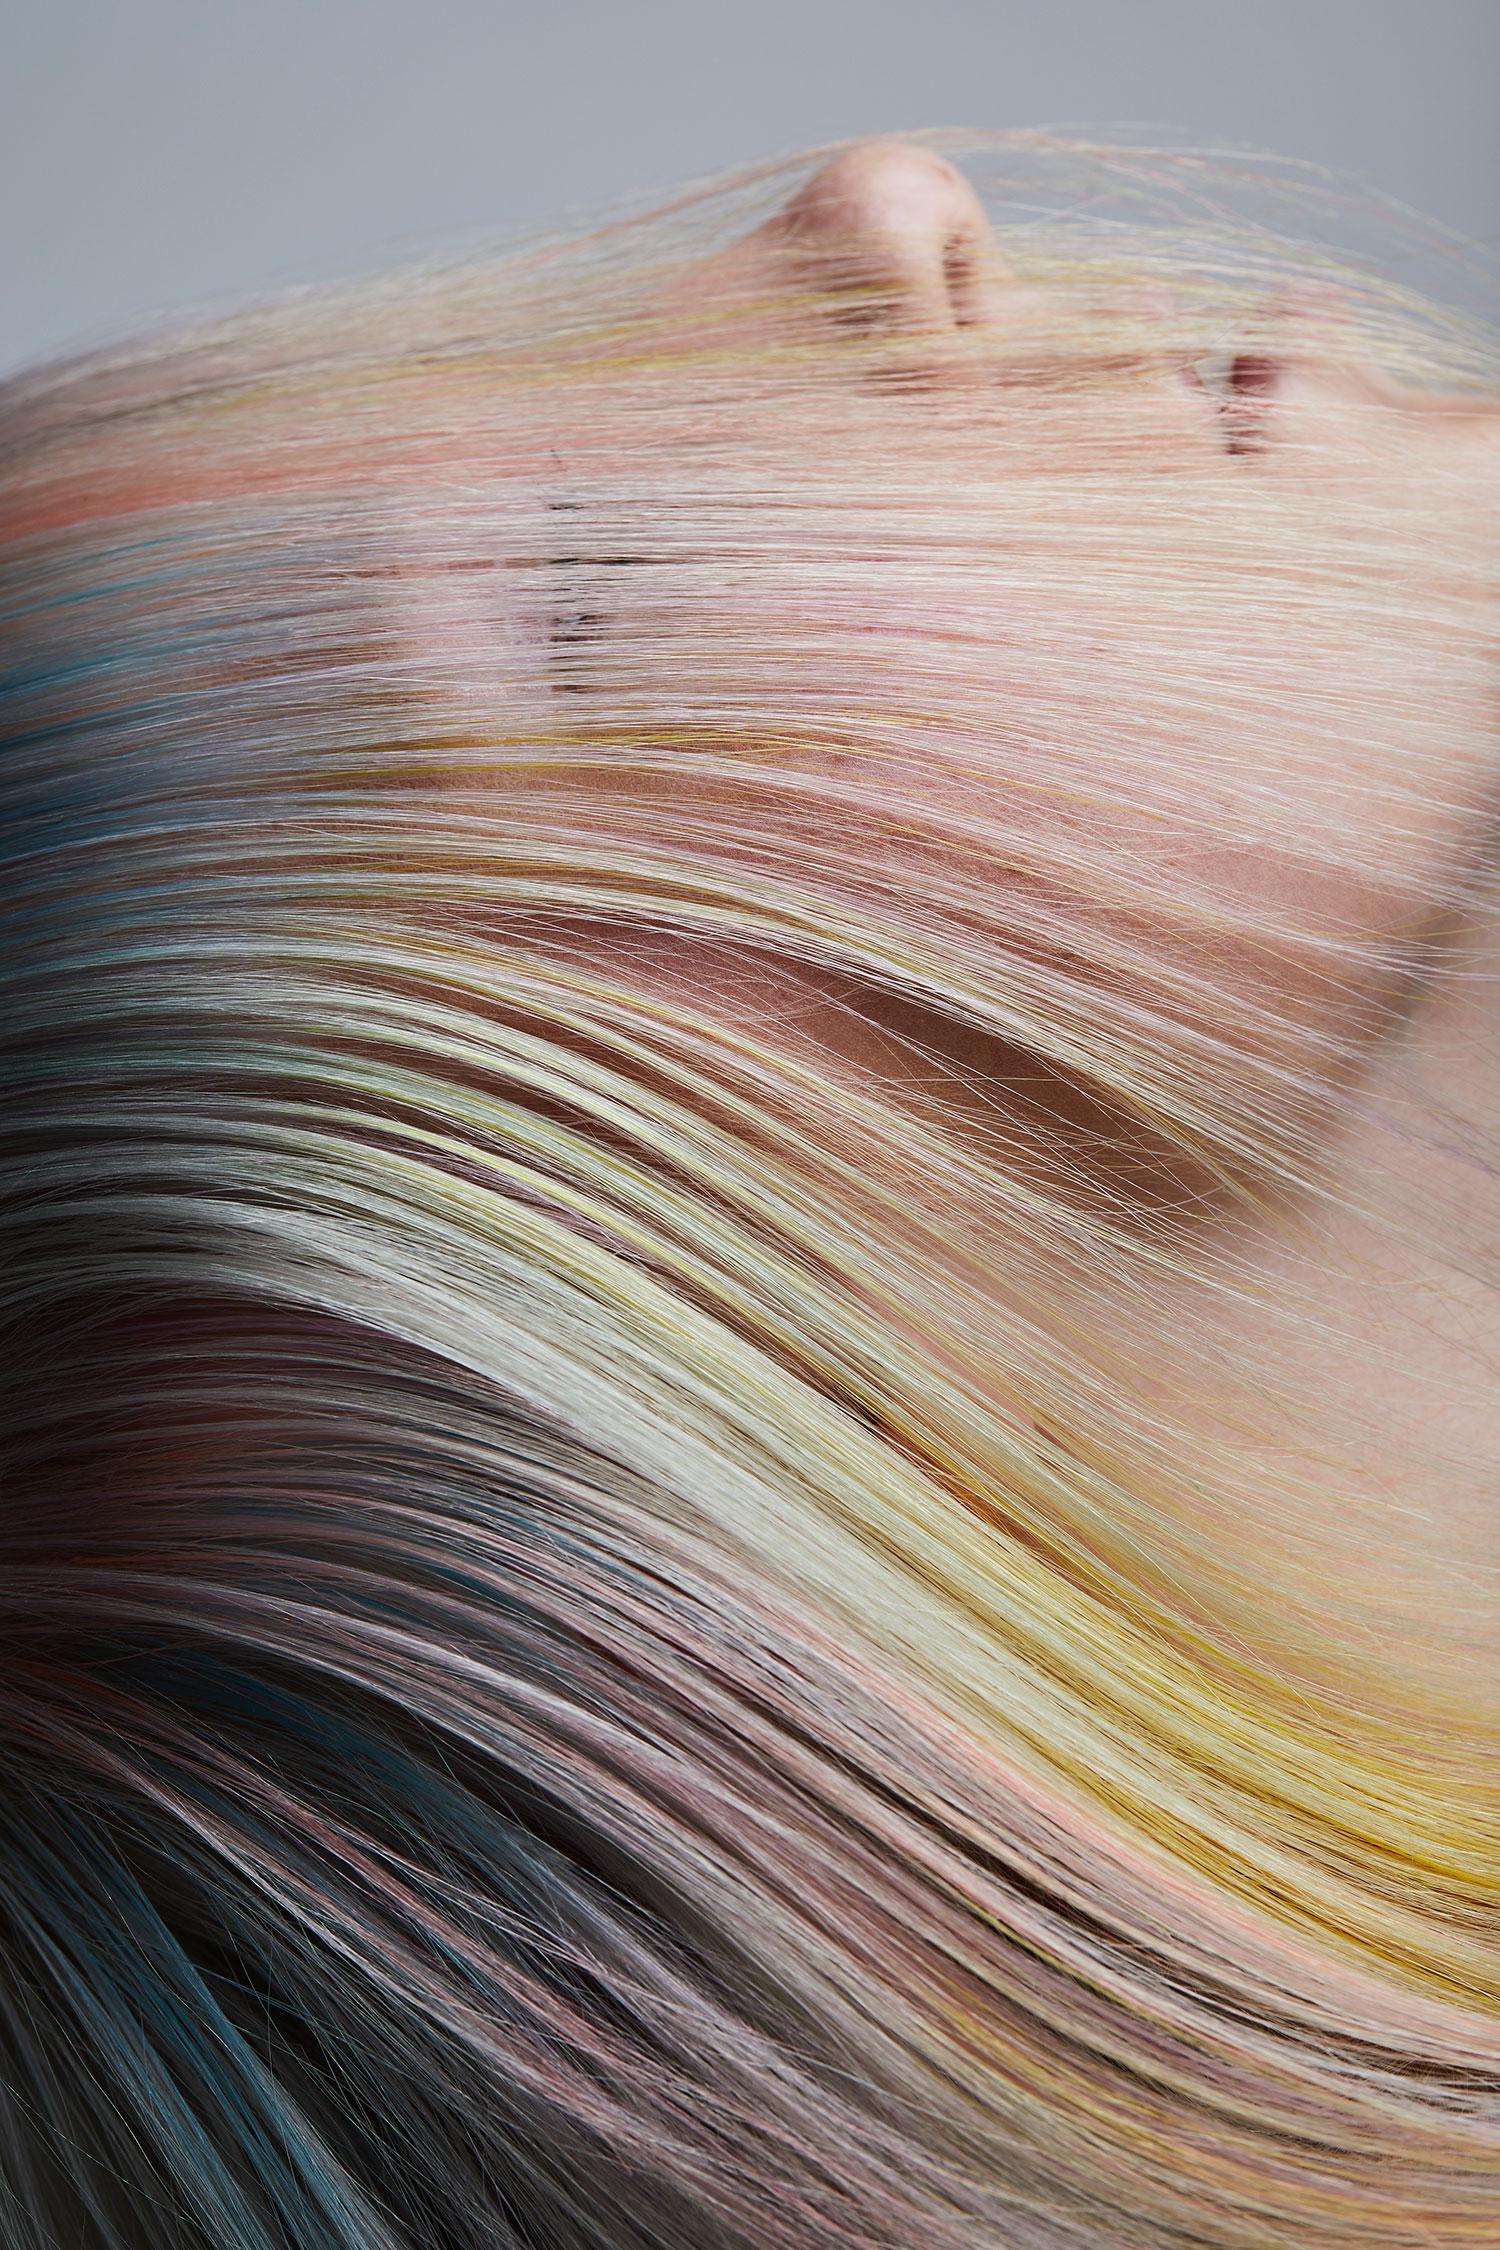 ahda+2019+unicorn+hair+pastel+haarfarbe+friseur+wien+1060+hairdresser+vienna+gumpendorfer+strasse+danny+van+tuijl+color+technician+danny+van+blogger+styling+makeup+tuijl3.jpeg